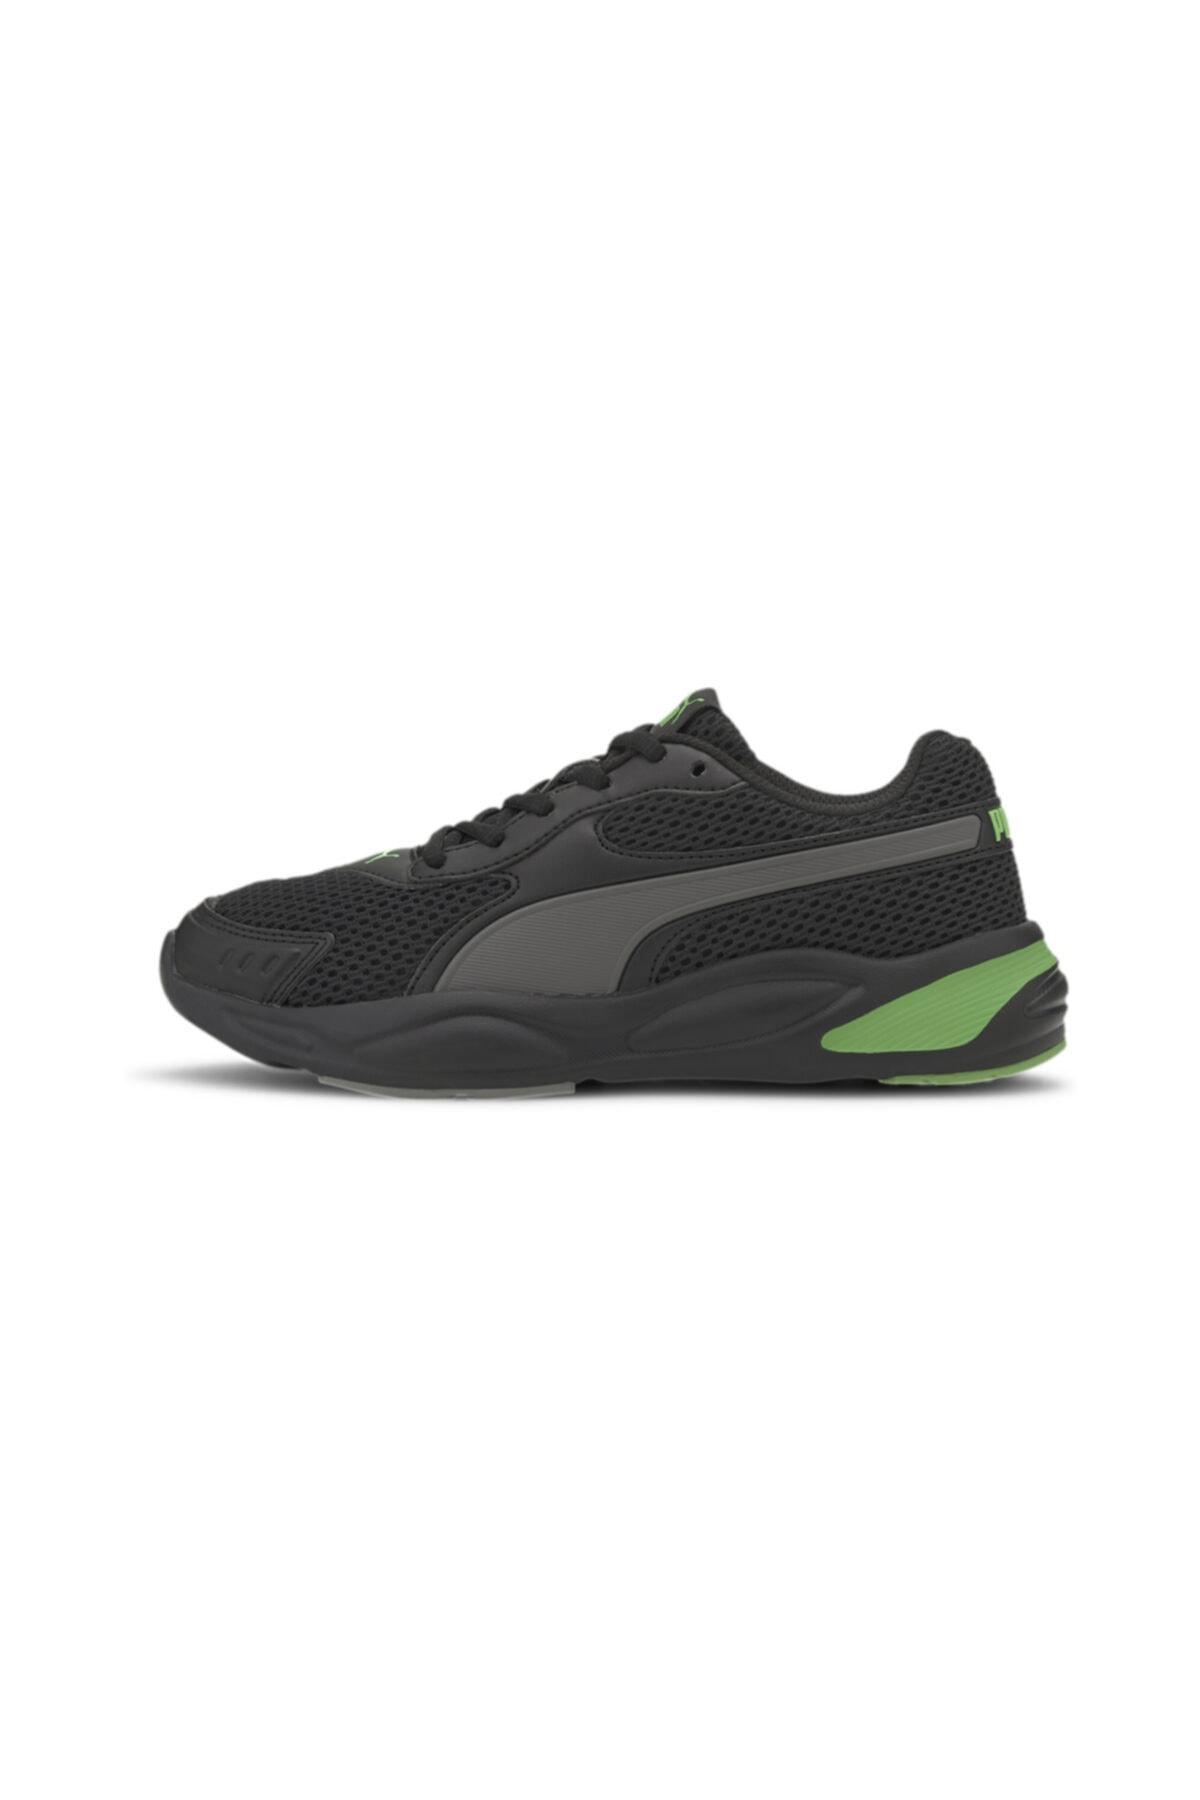 Puma Kadın Siyah 90s Runner Mesh Jr  Ayakkabı 37292605 2